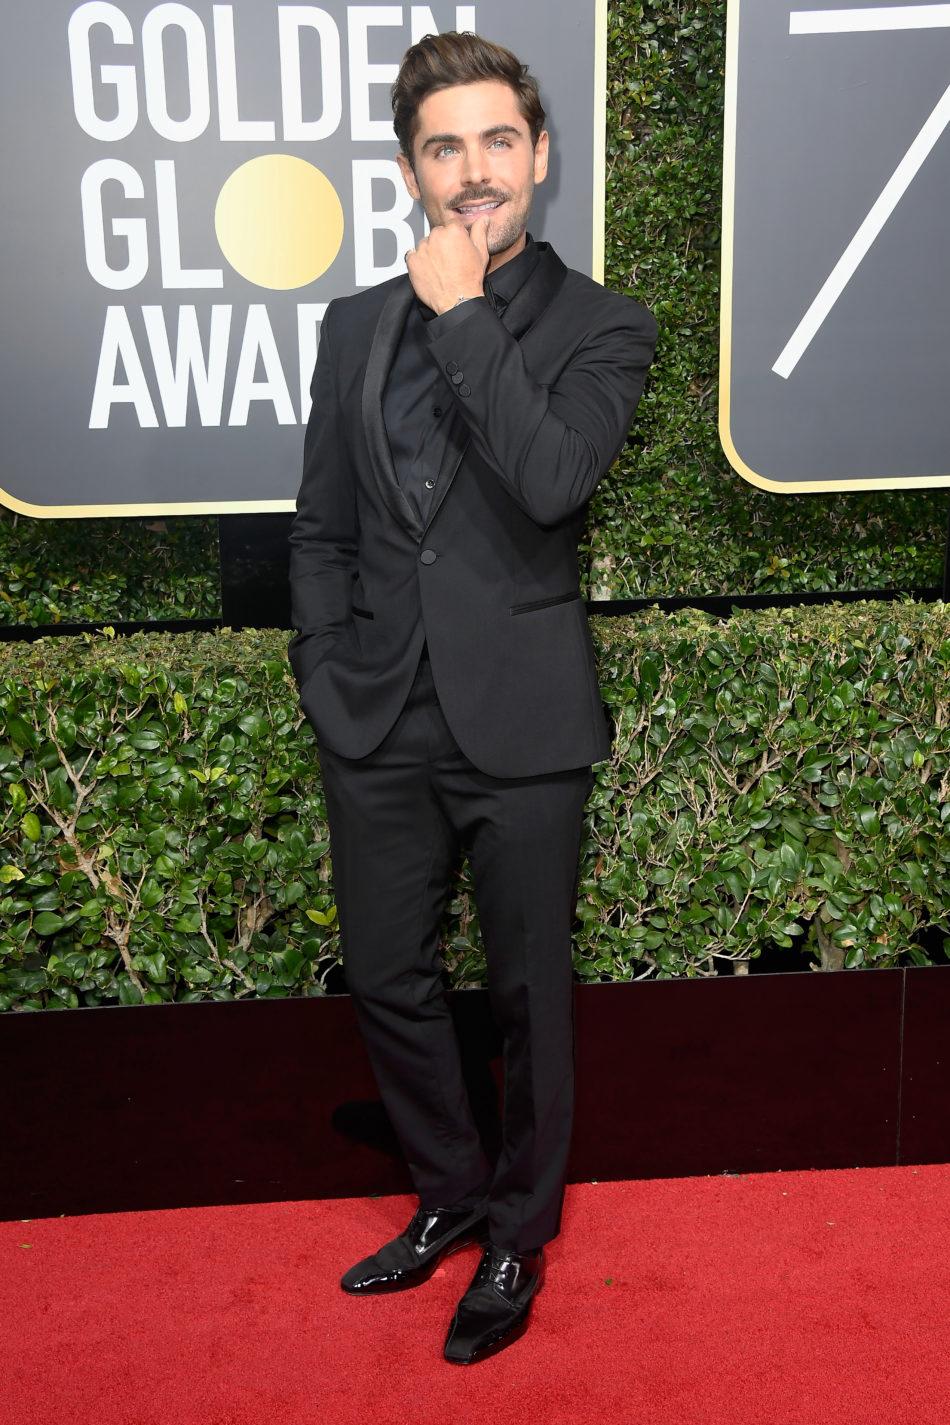 Golden Globes 2018, Red Carpet, Alfombra Roja, Tuxedos, Trajes, Ternos, Hombres, Looks, Outfits, Premiación, Masculinos, Estilismos, Vestir bien, Zac Efron